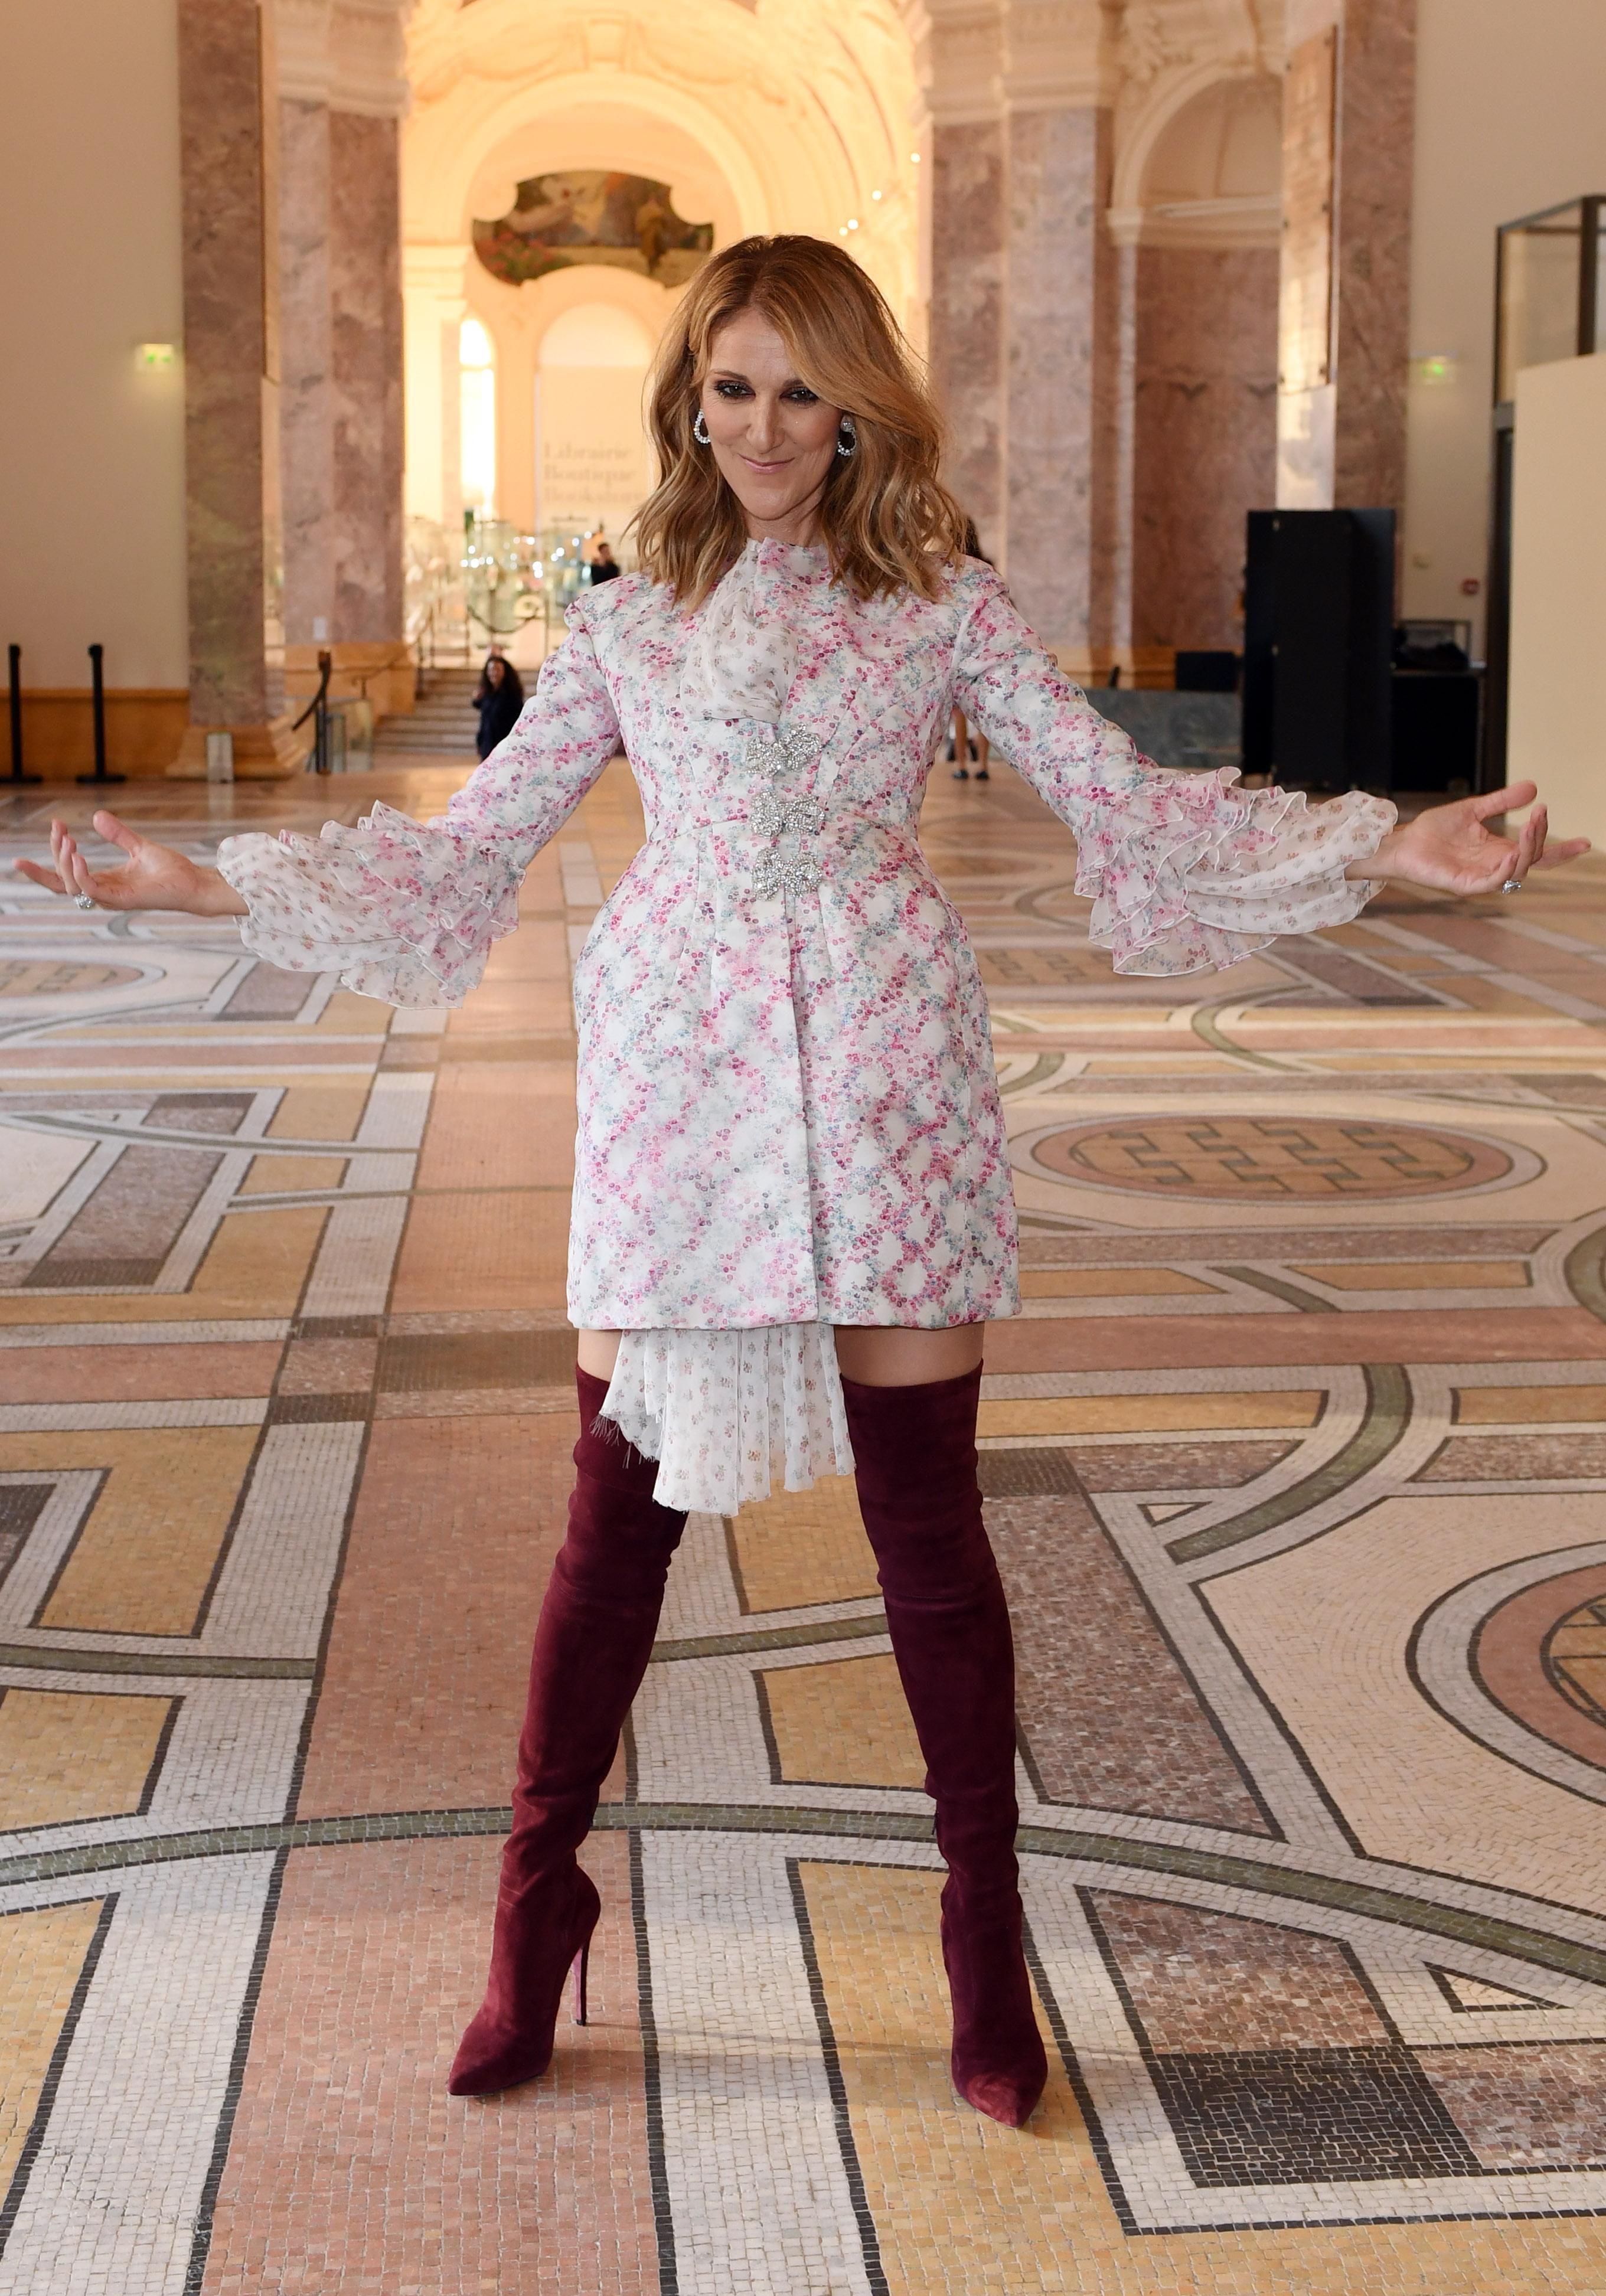 Céline Dion backstageGiambattista Valli show, Fall Winter 2017, Haute Couture Fashion Week, Paris, France - 03 Jul 2017WEARING GIAMBATTISTA VALLI SAME OUTFIT AS CATWALK MODEL *5745219h